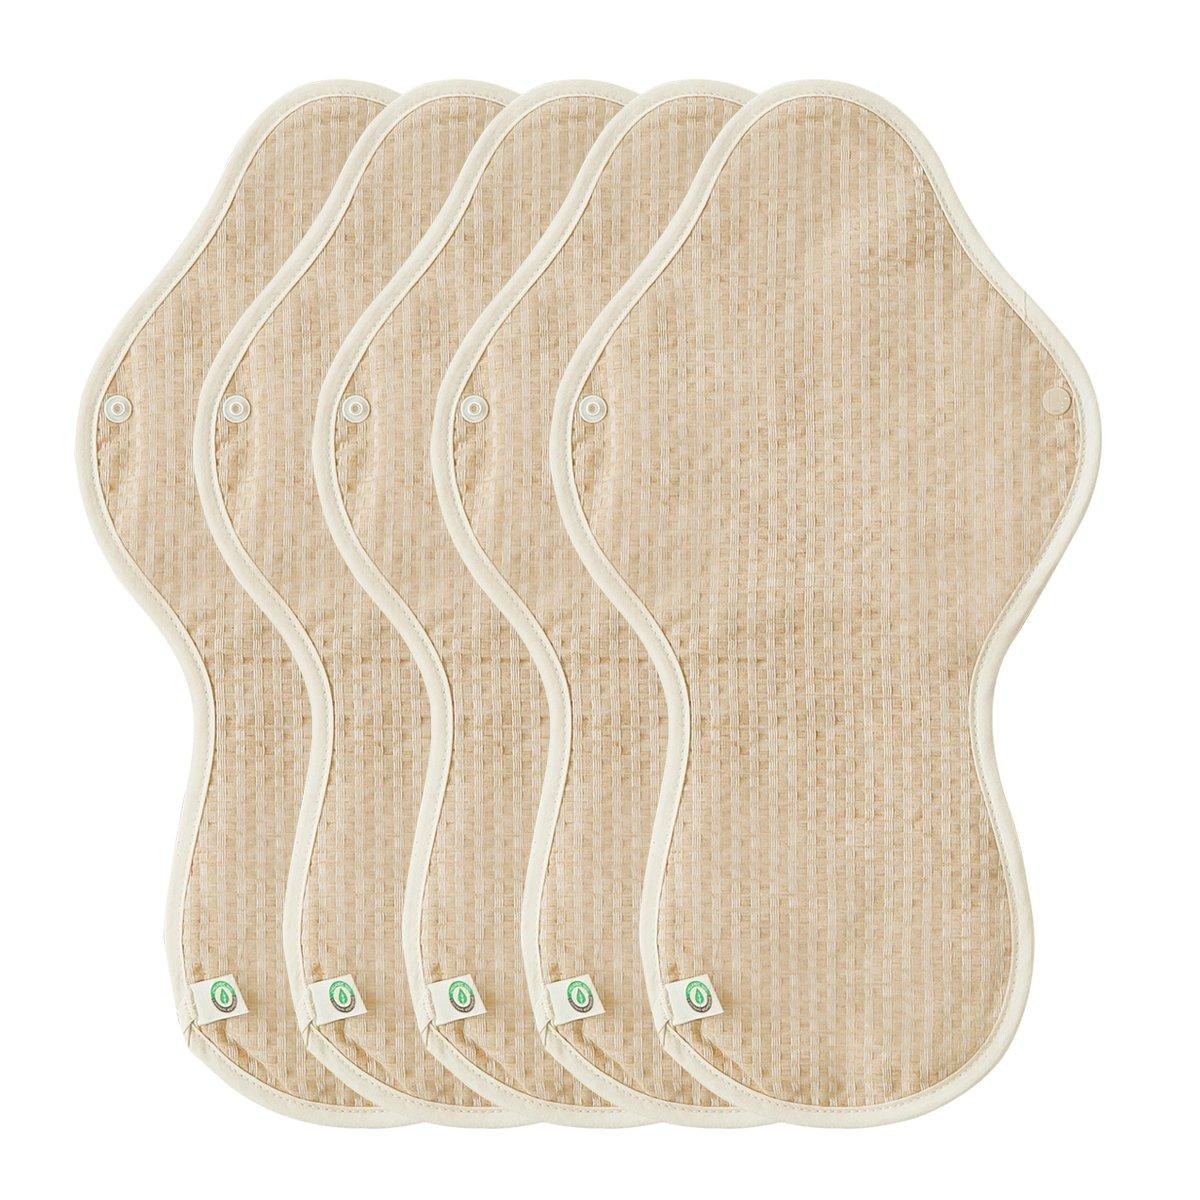 THINKECO [5 Pads] Organic-Hanji Reusable Menstrual Cotton Pads, Sanitary Napkins (XL) by THINKECO (Image #1)